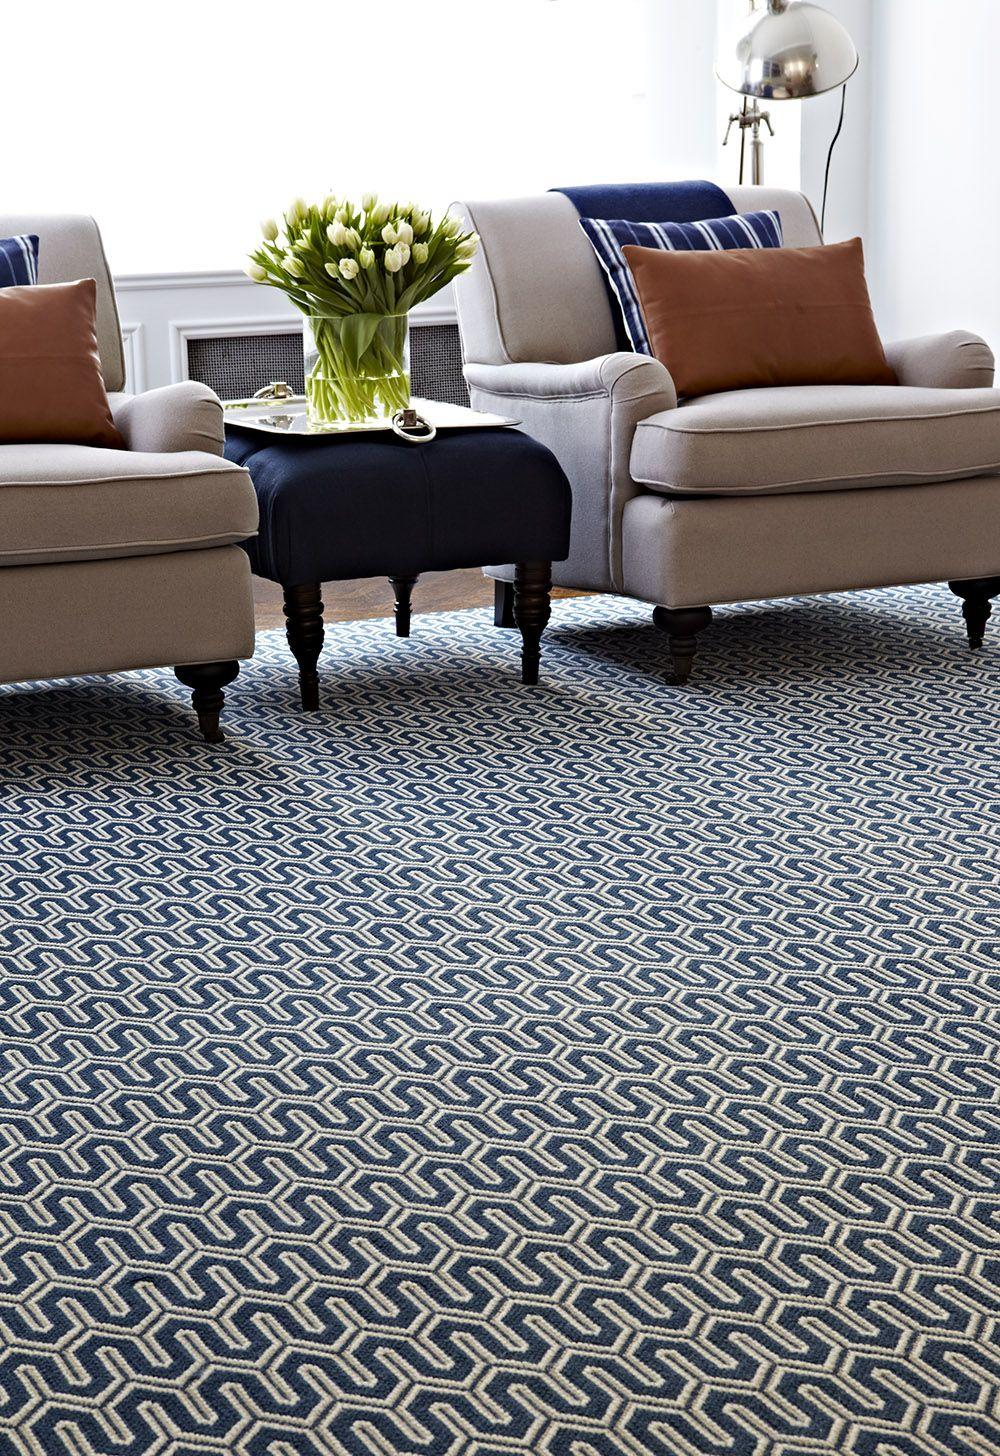 A Striking Navy Geometric Rug In Living Room Stanton